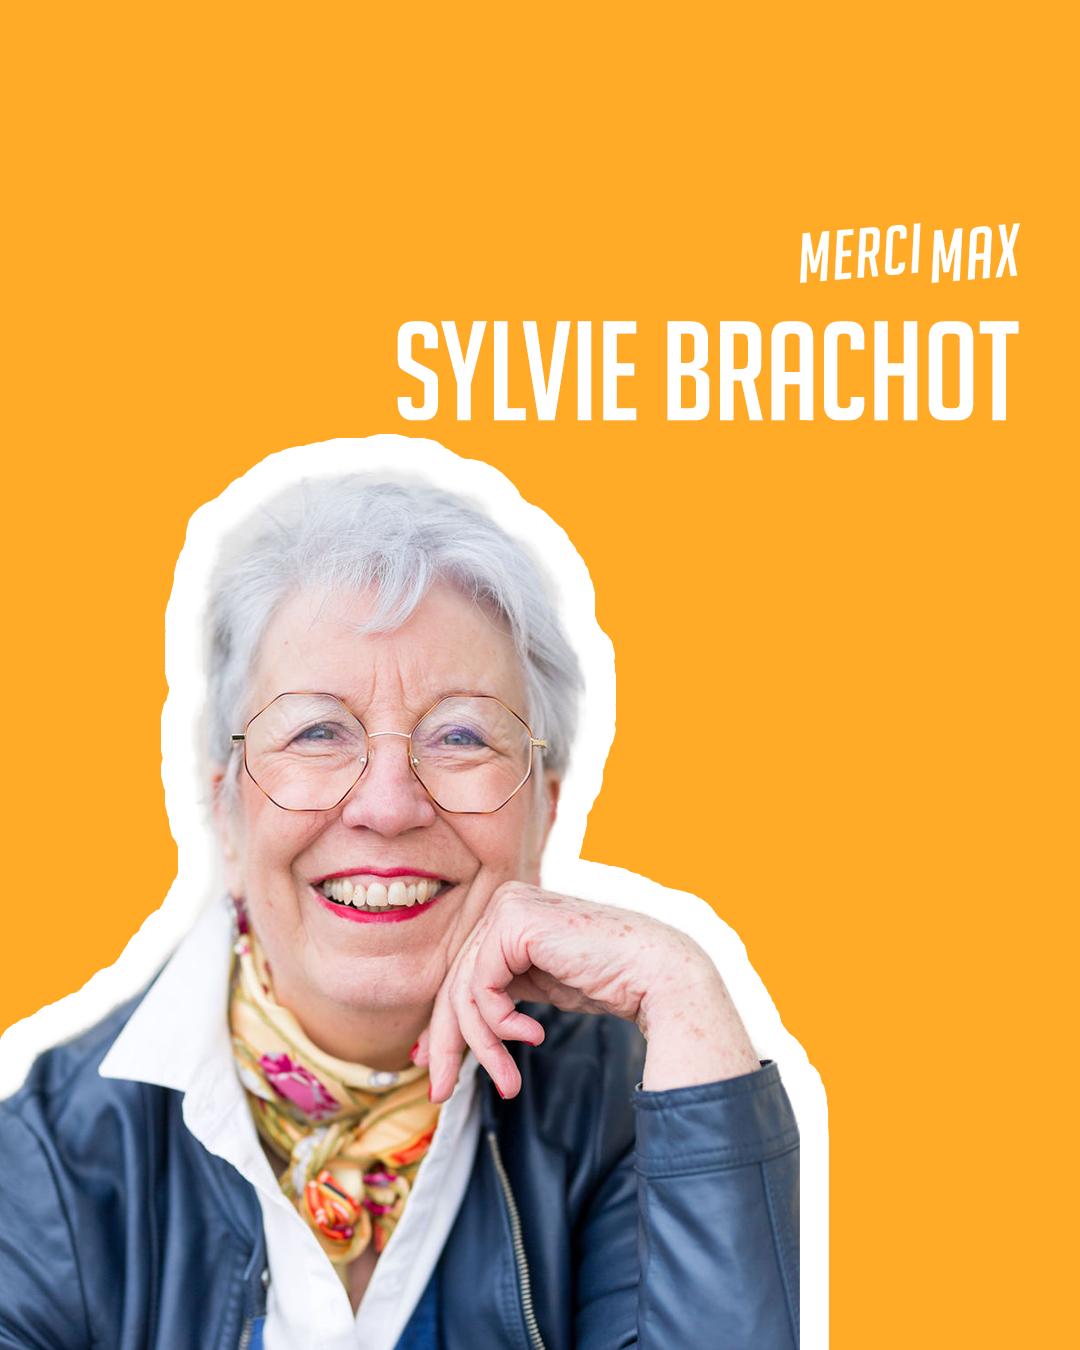 Sylvie, Max Fashion